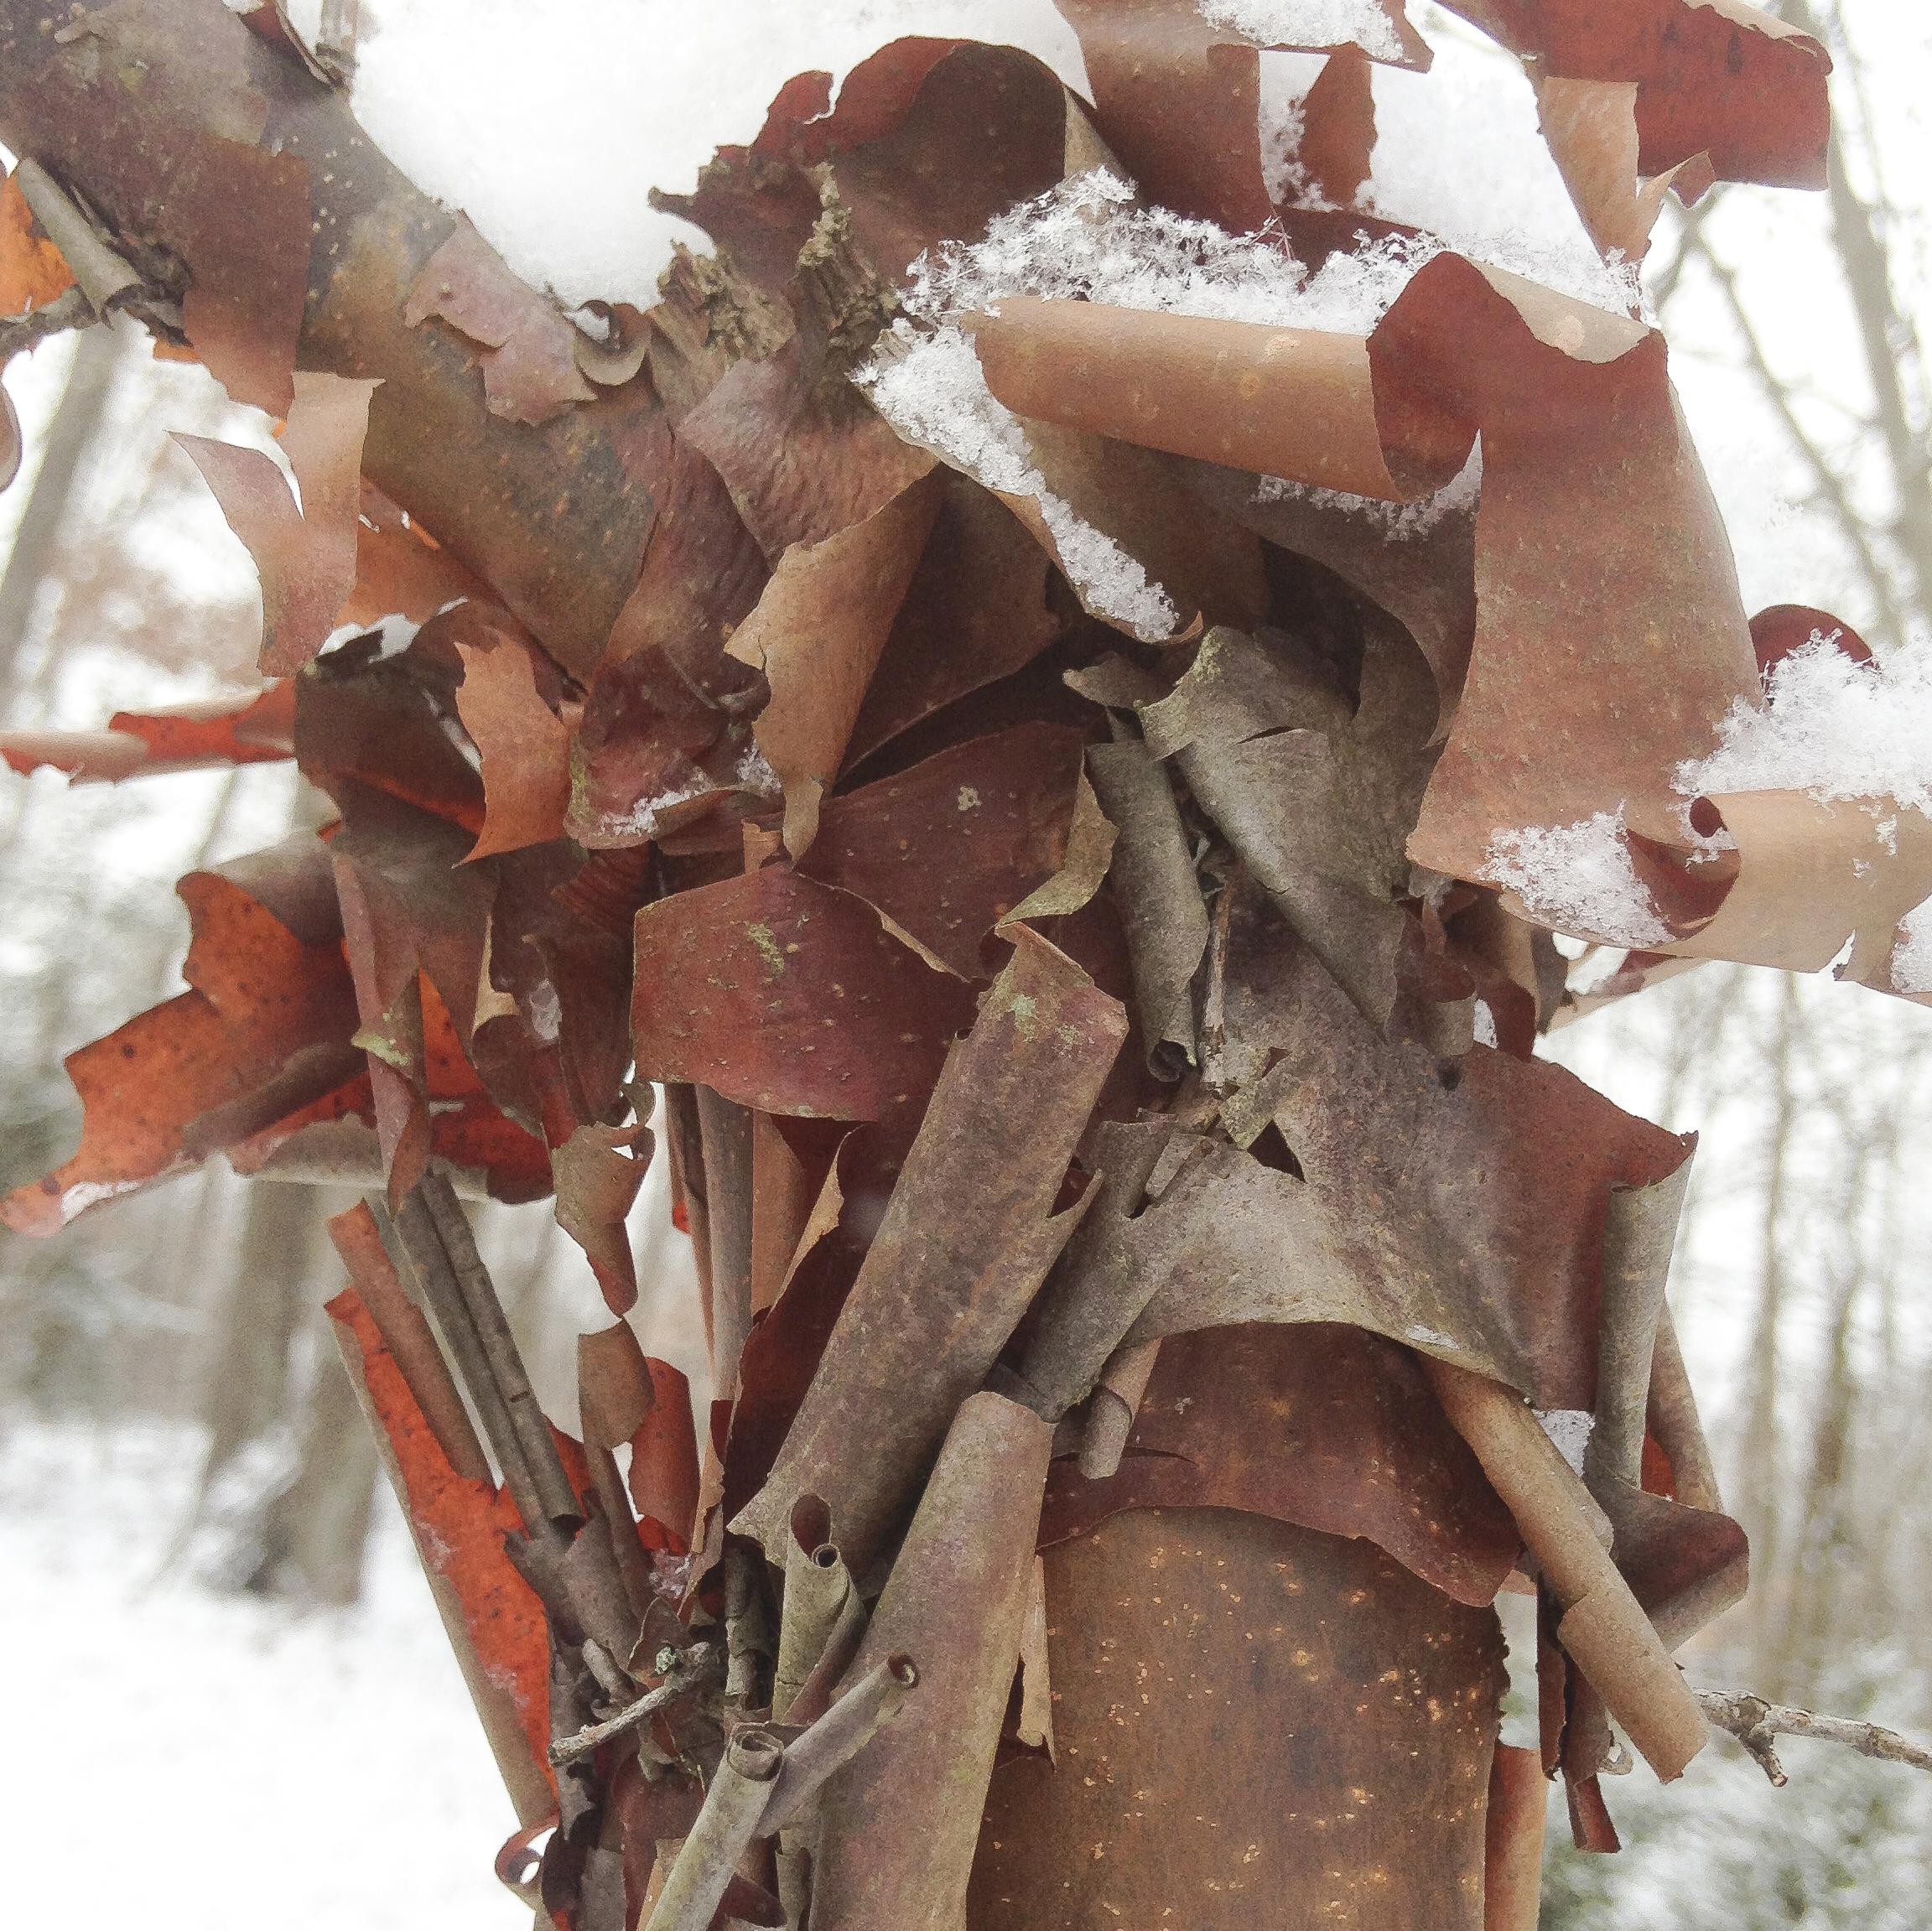 Paperbark Maple - The magnificent exfoliating bark of Paperbark maple, Acer griseum.